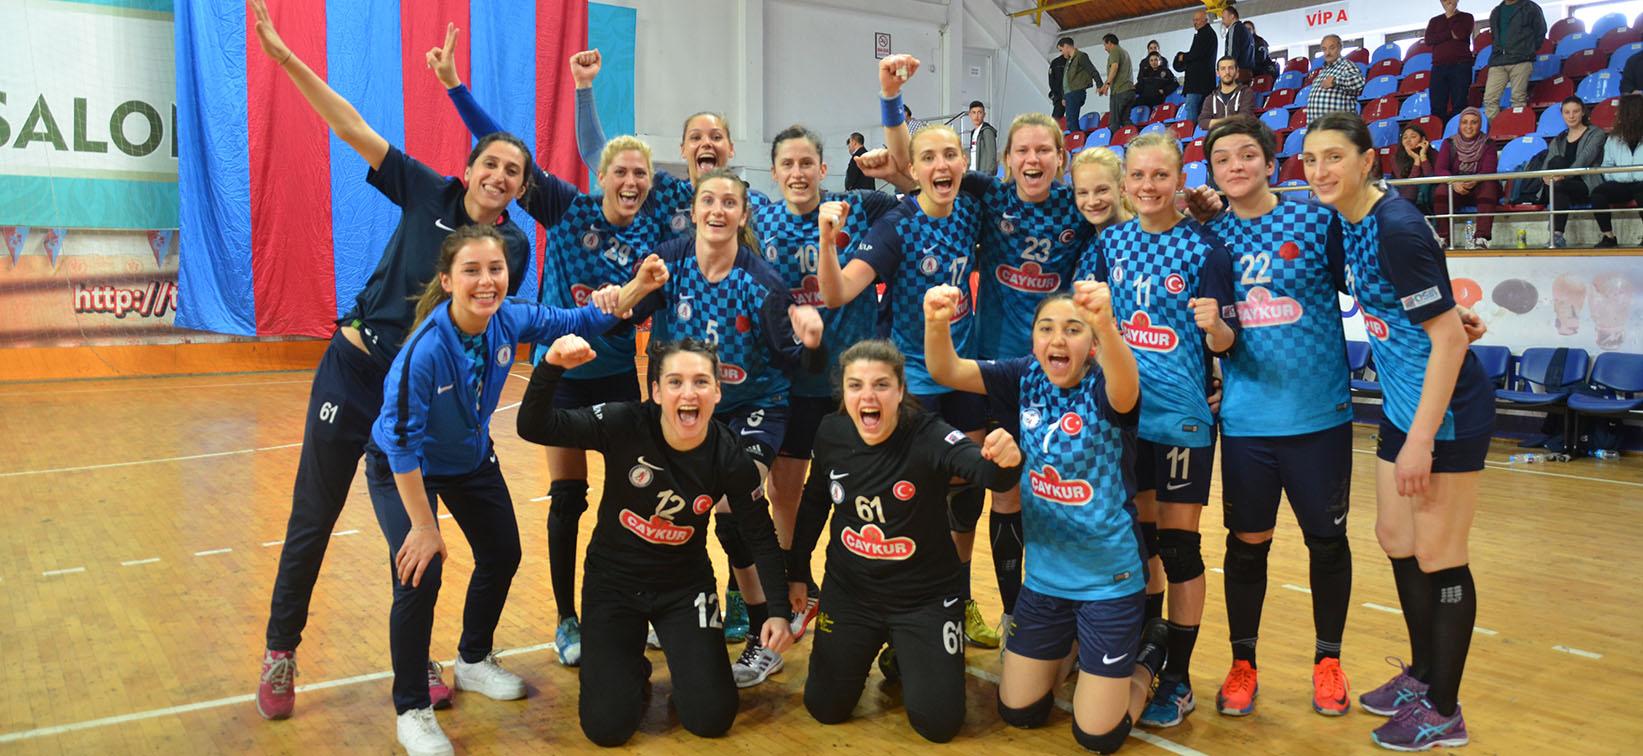 Zağnosspor'da Çeyrek Final Sevinci